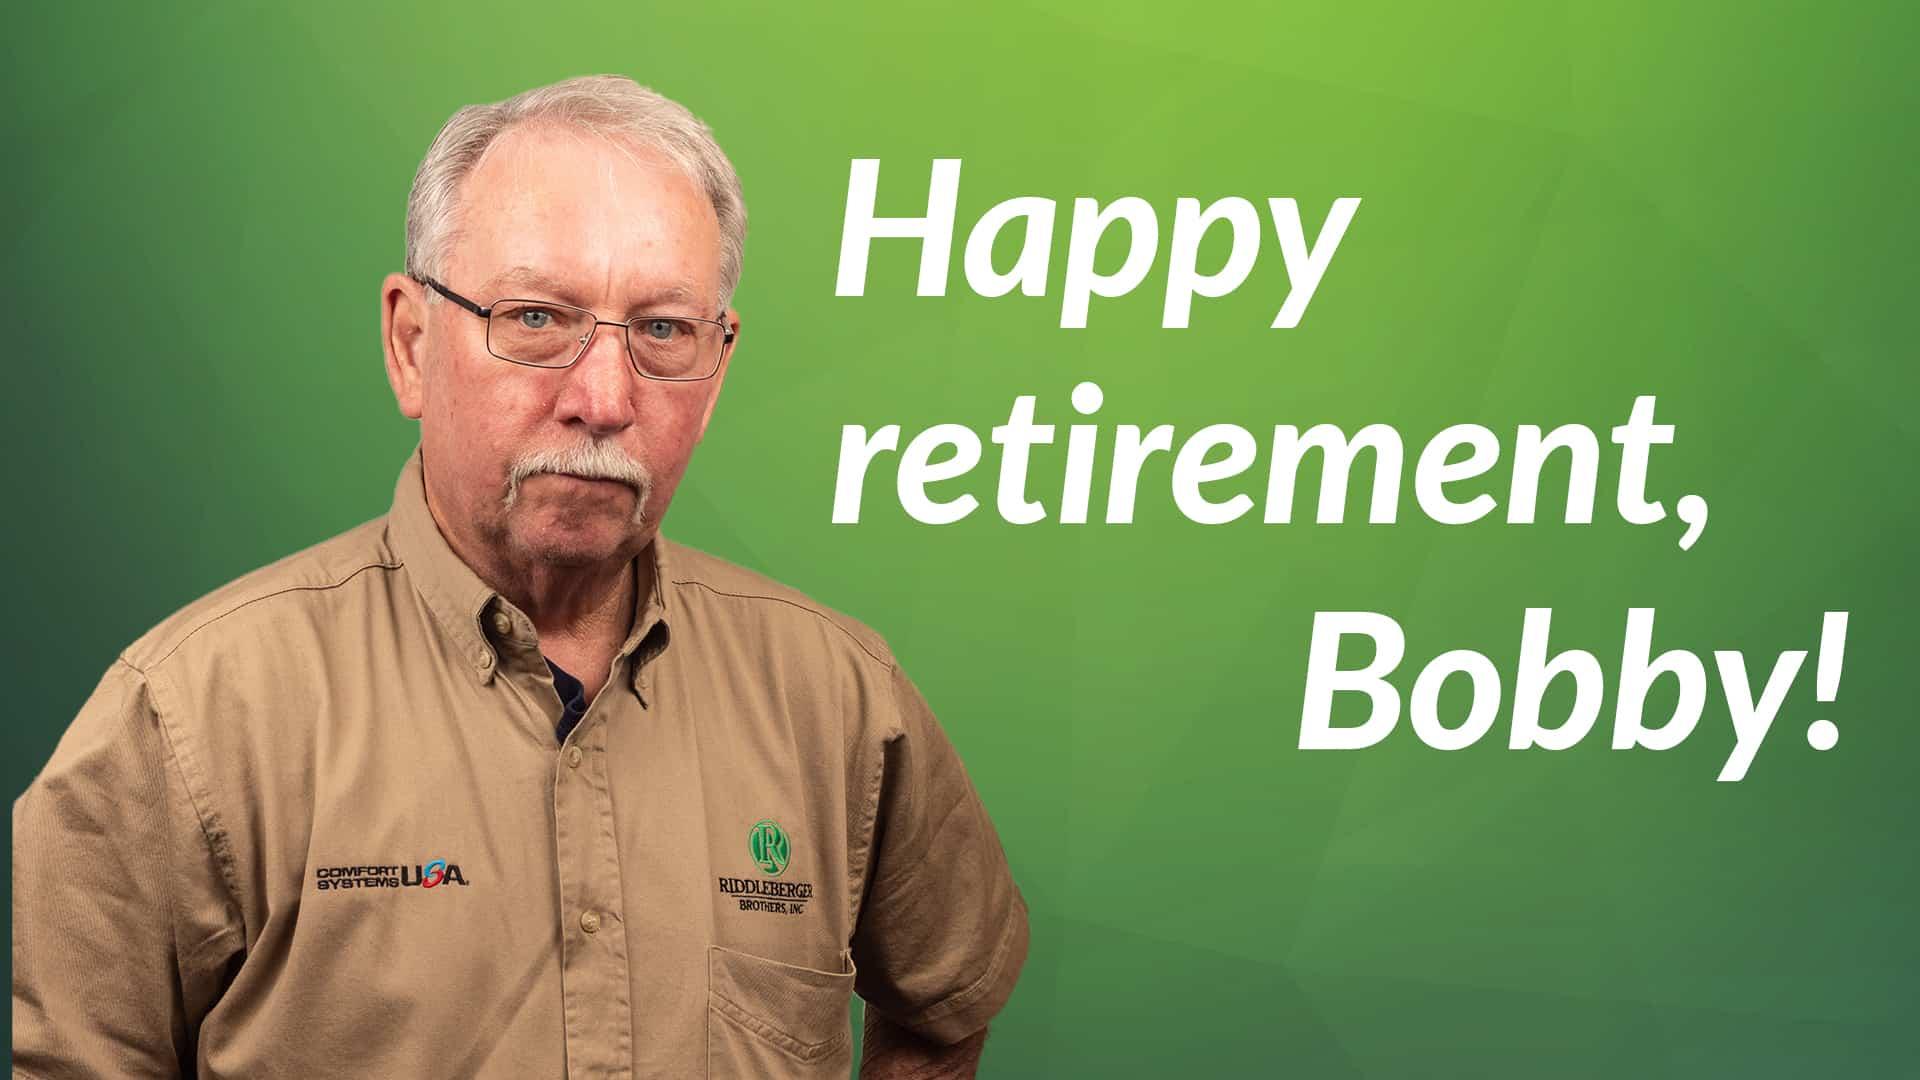 Bobby Retires